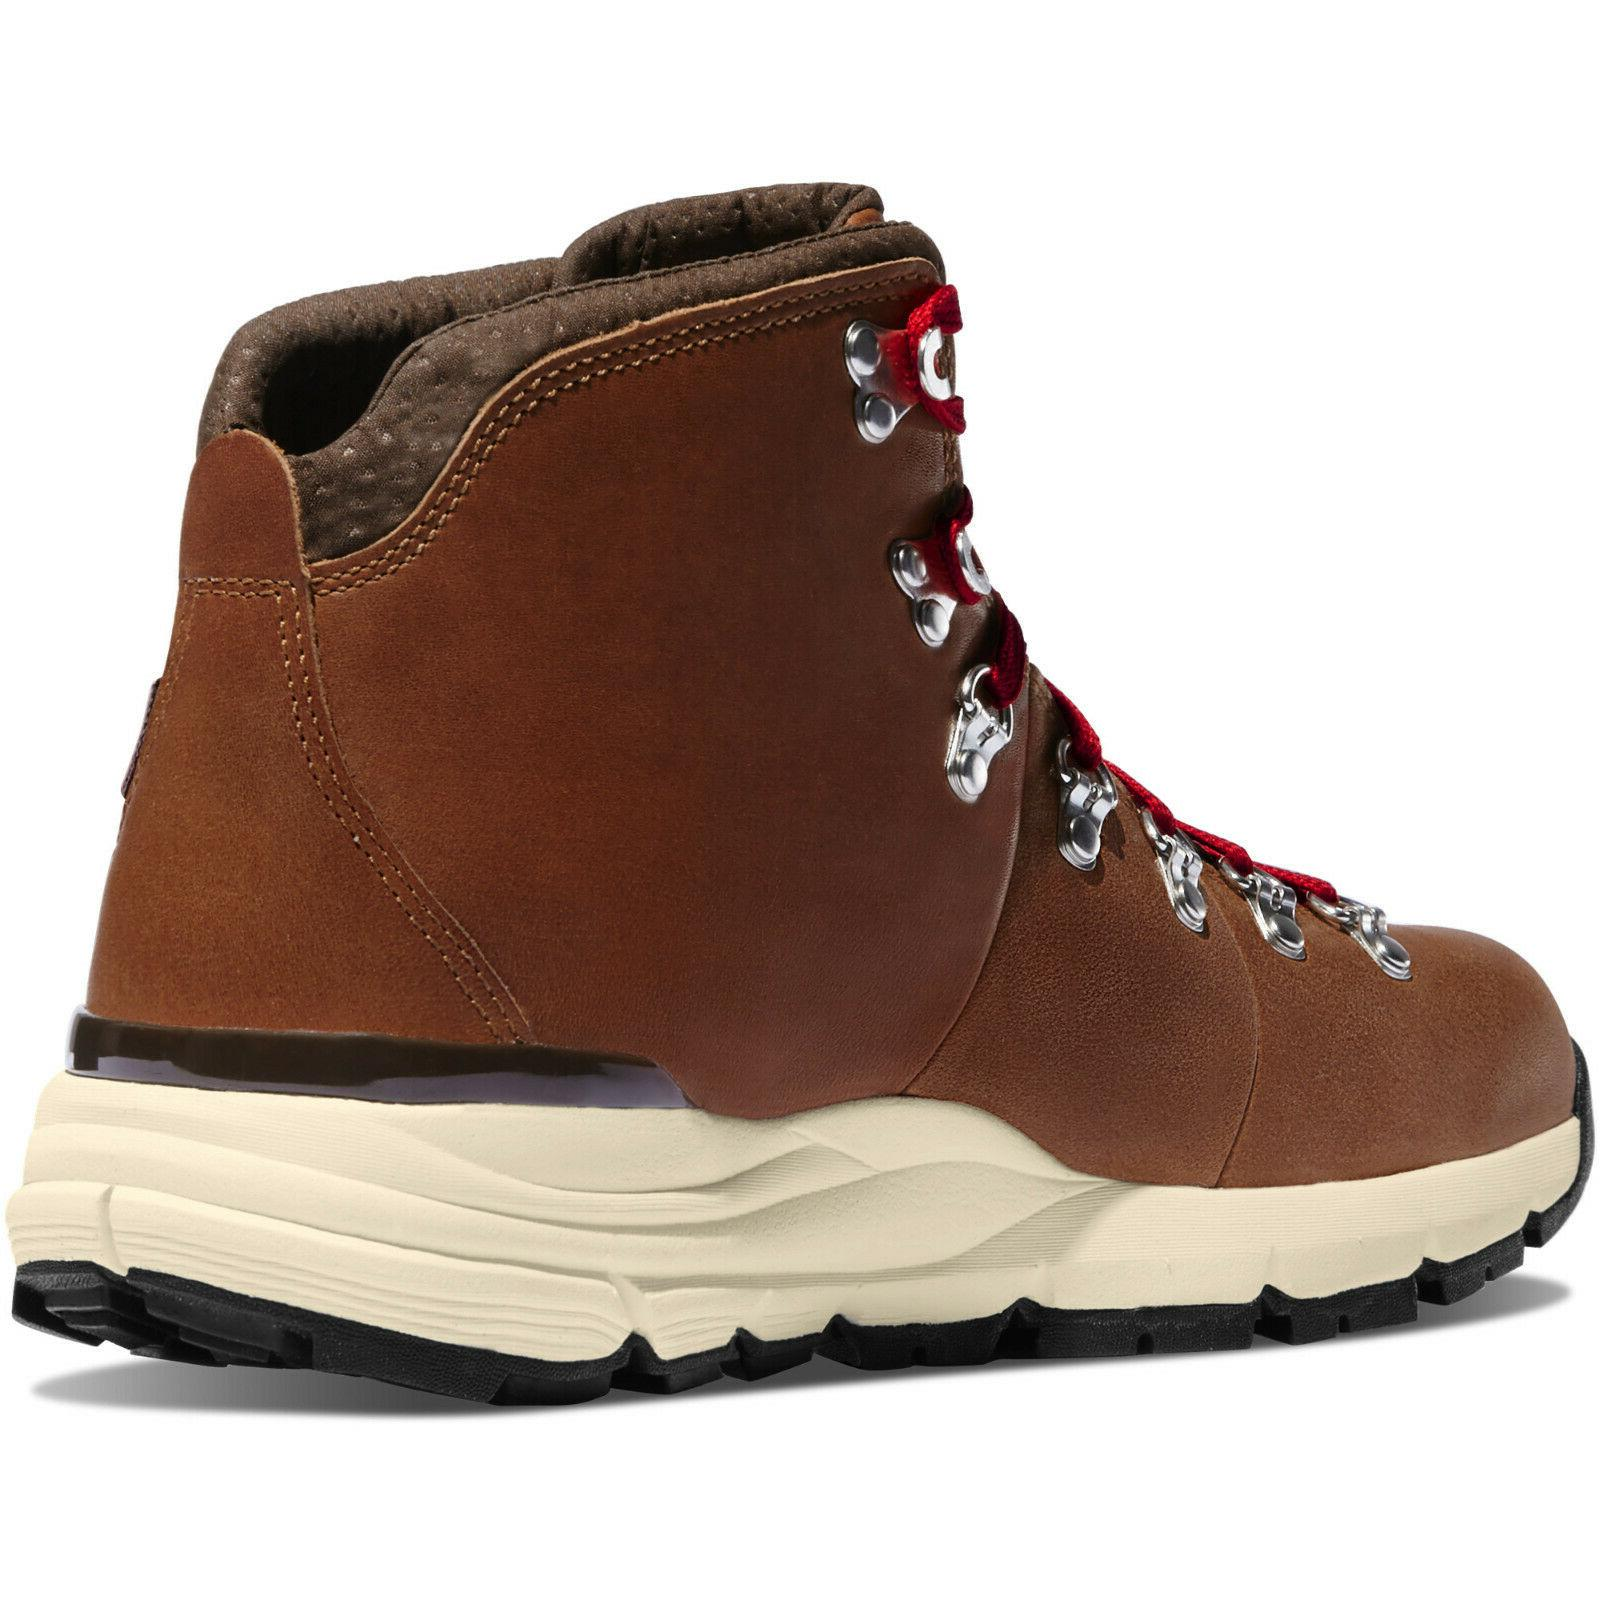 "Danner Men's Mountain 4.5"" Waterproof Saddle"